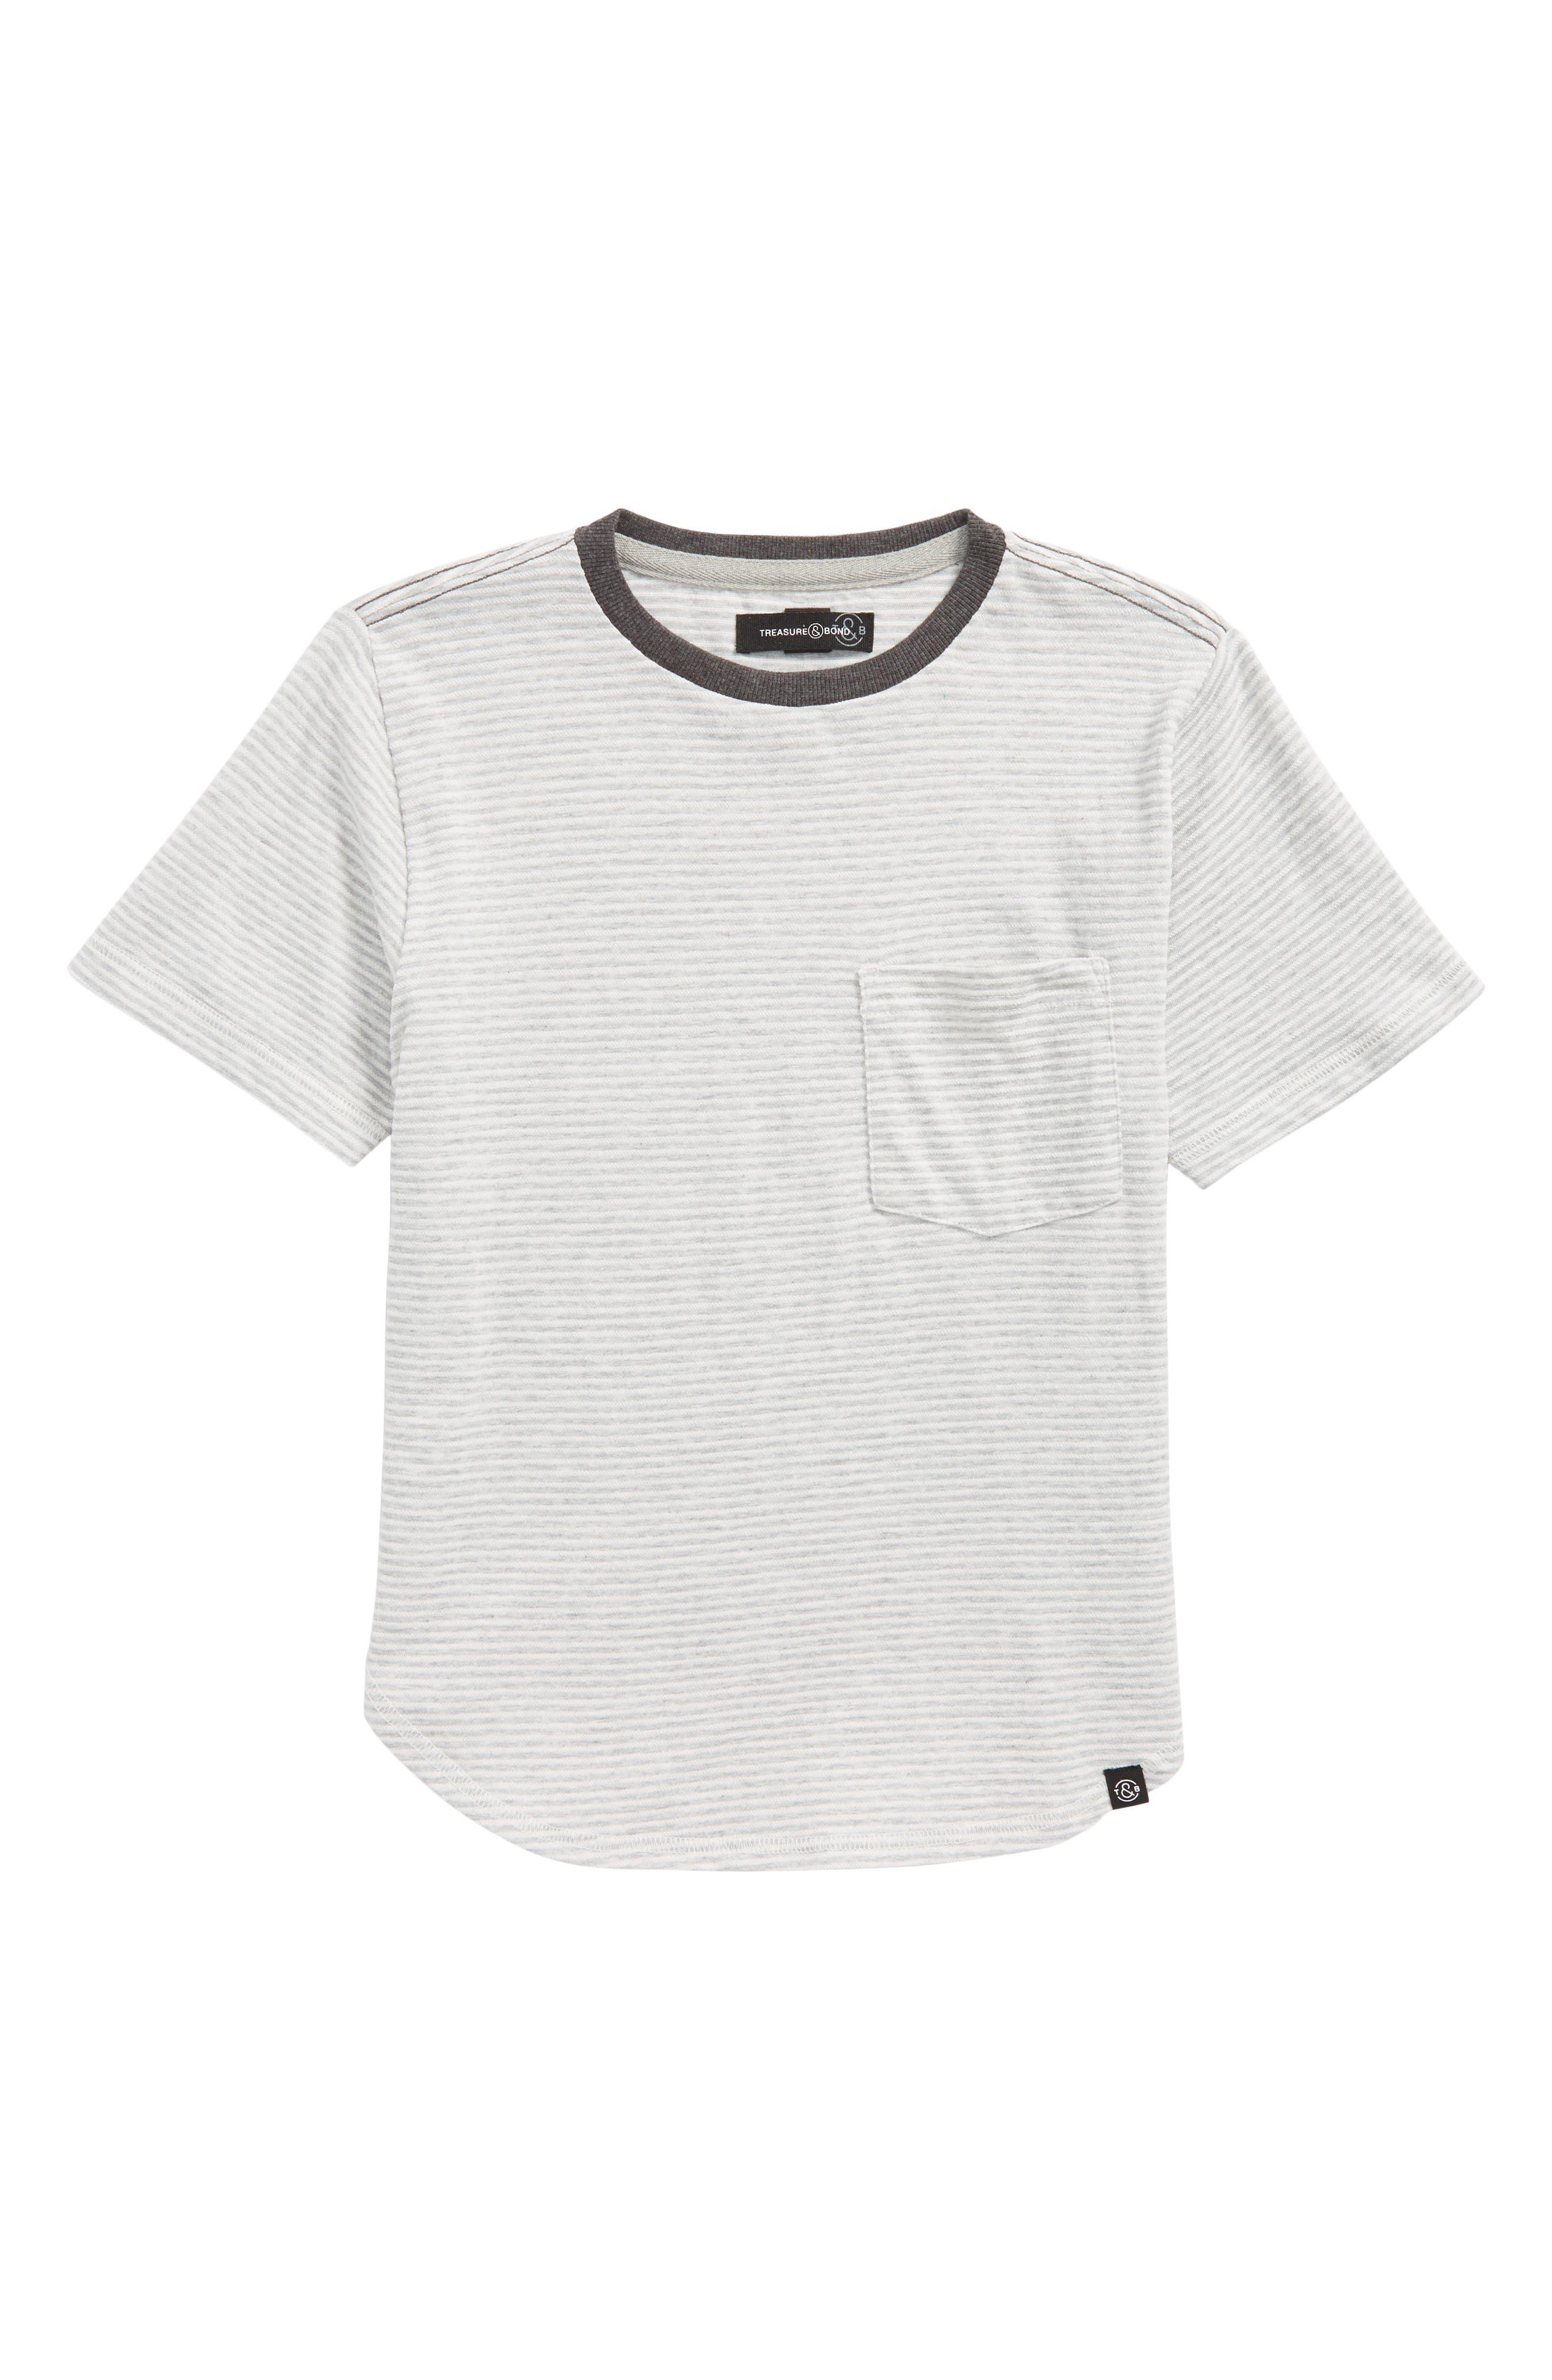 Stripe Pocket T-Shirt,                         Main,                         color, 030